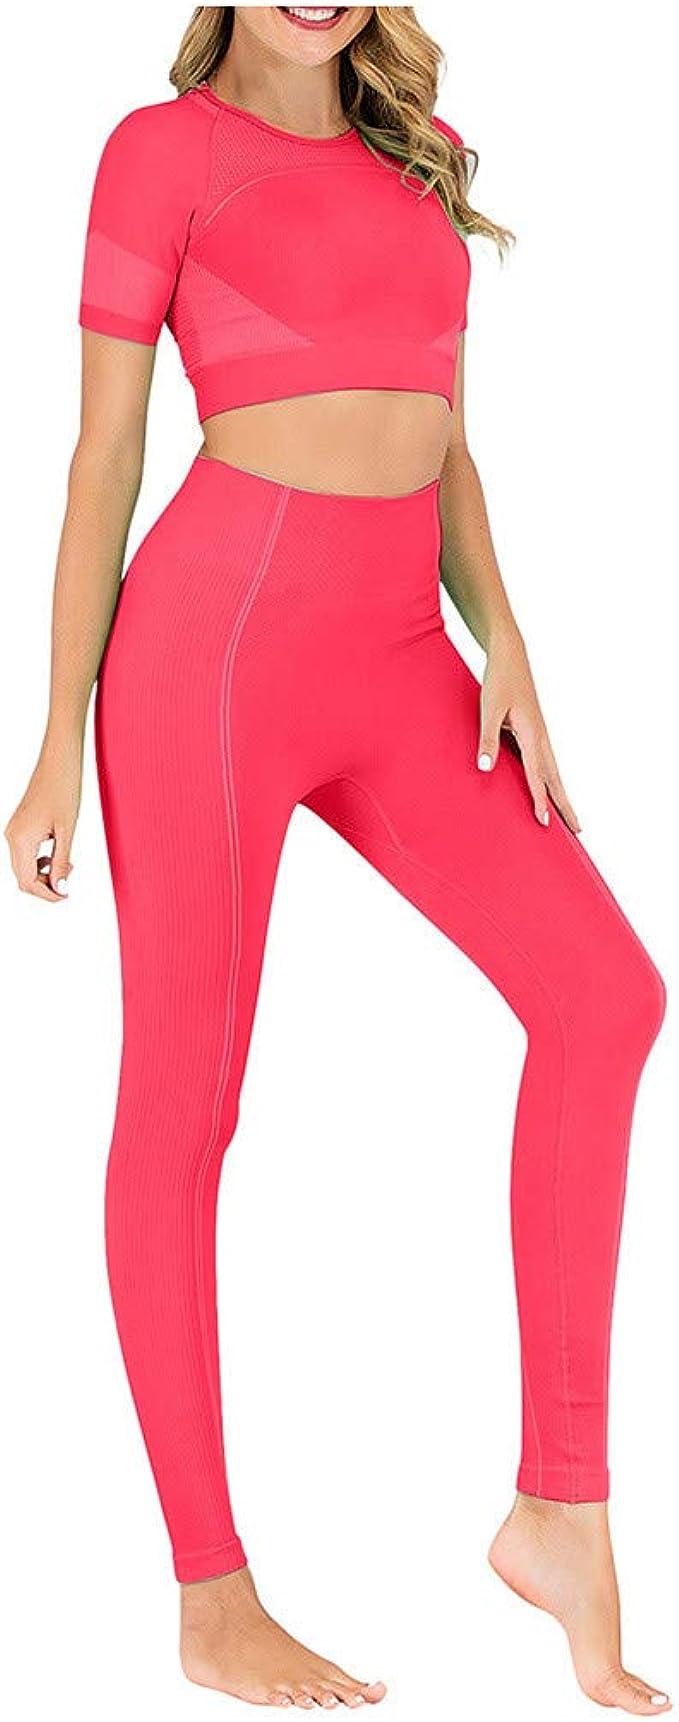 fengleas Damen Sportanzüge Yoga Kleidung Set Jogginganzug Sport ...